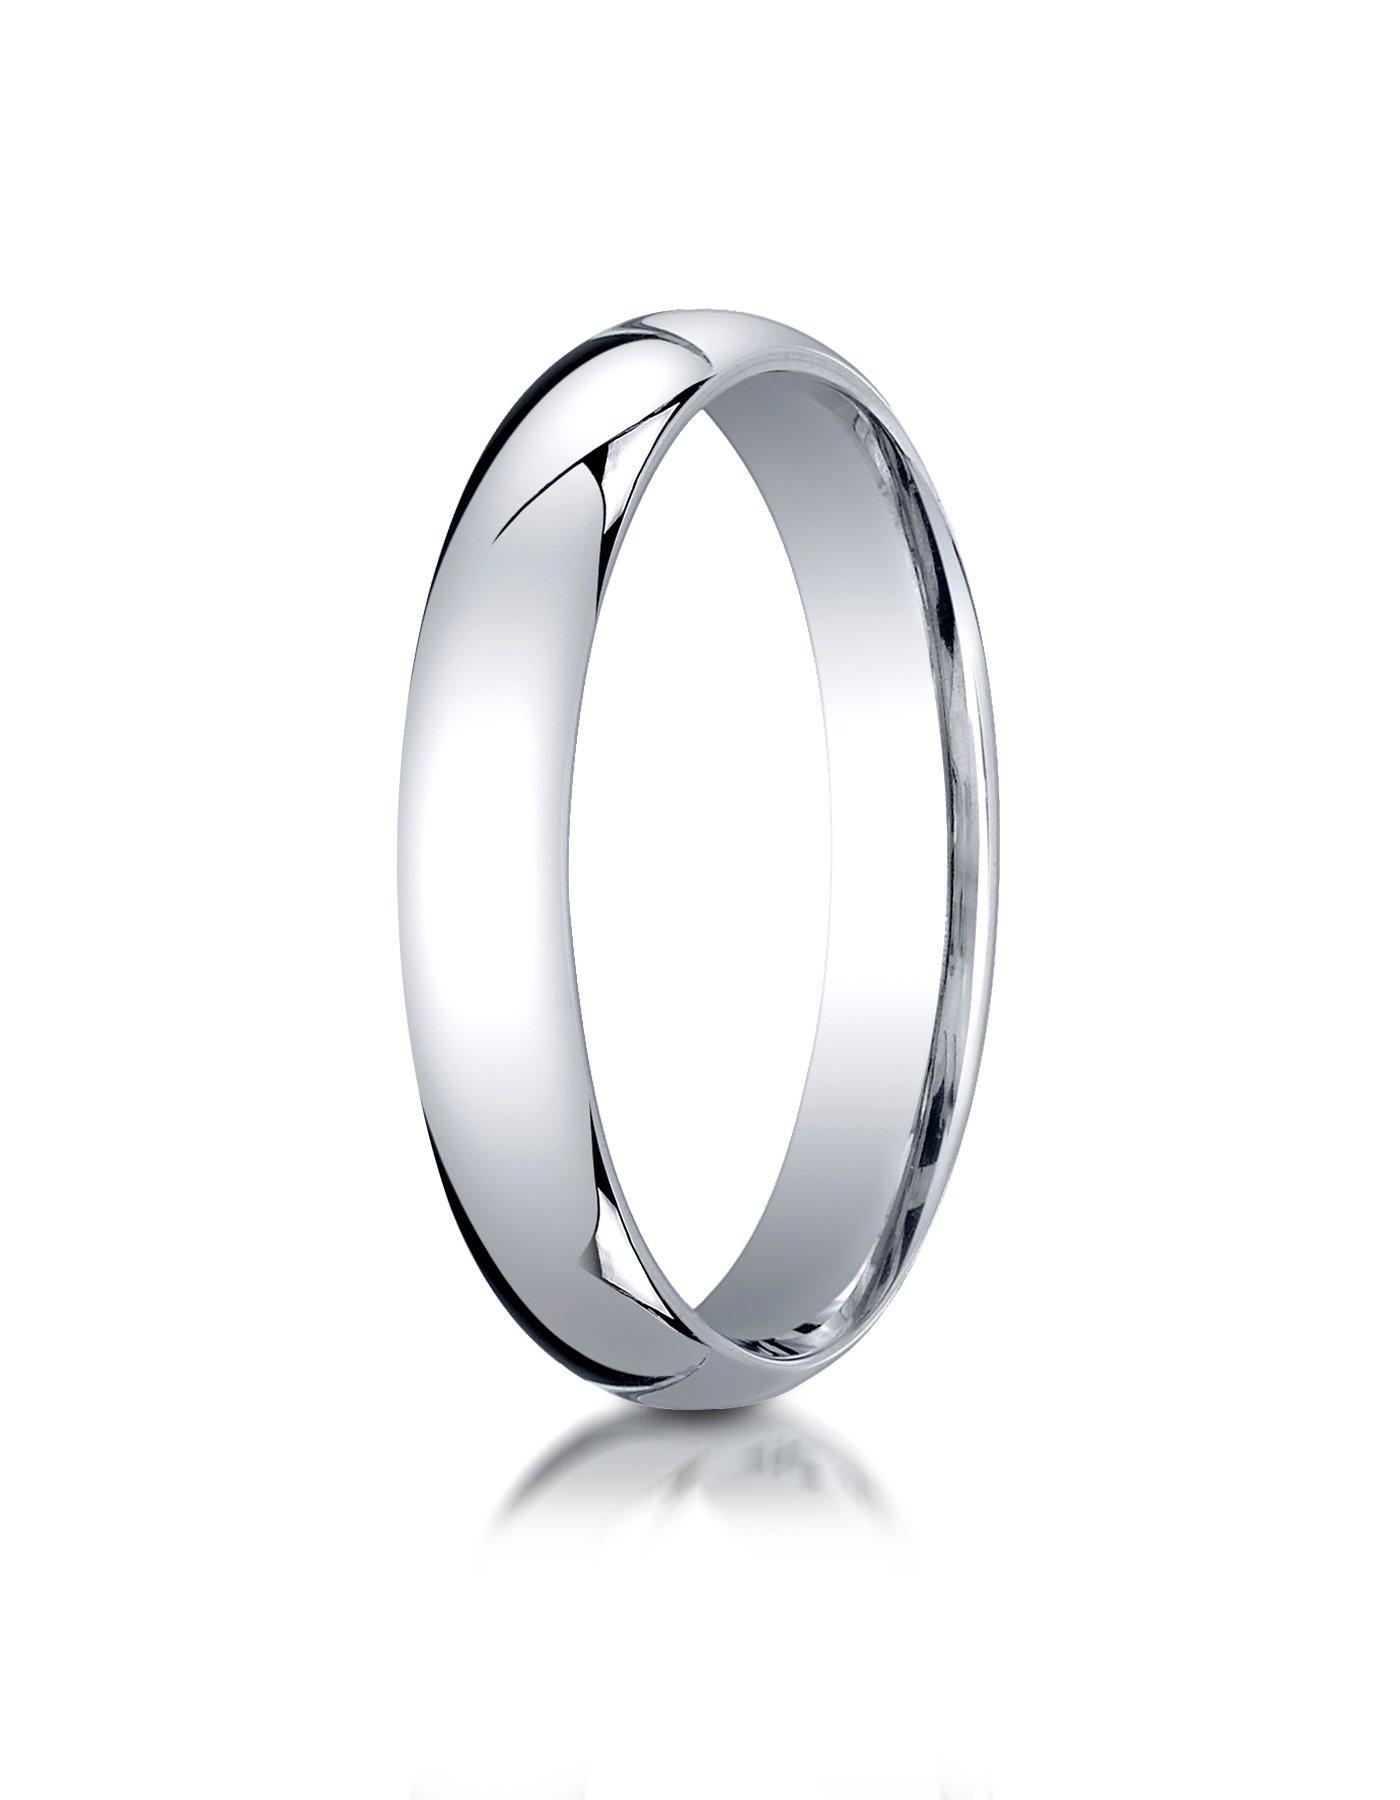 Mens 14K White Gold, 4mm Slim Profile Comfort-Fit Ring (sz 13)